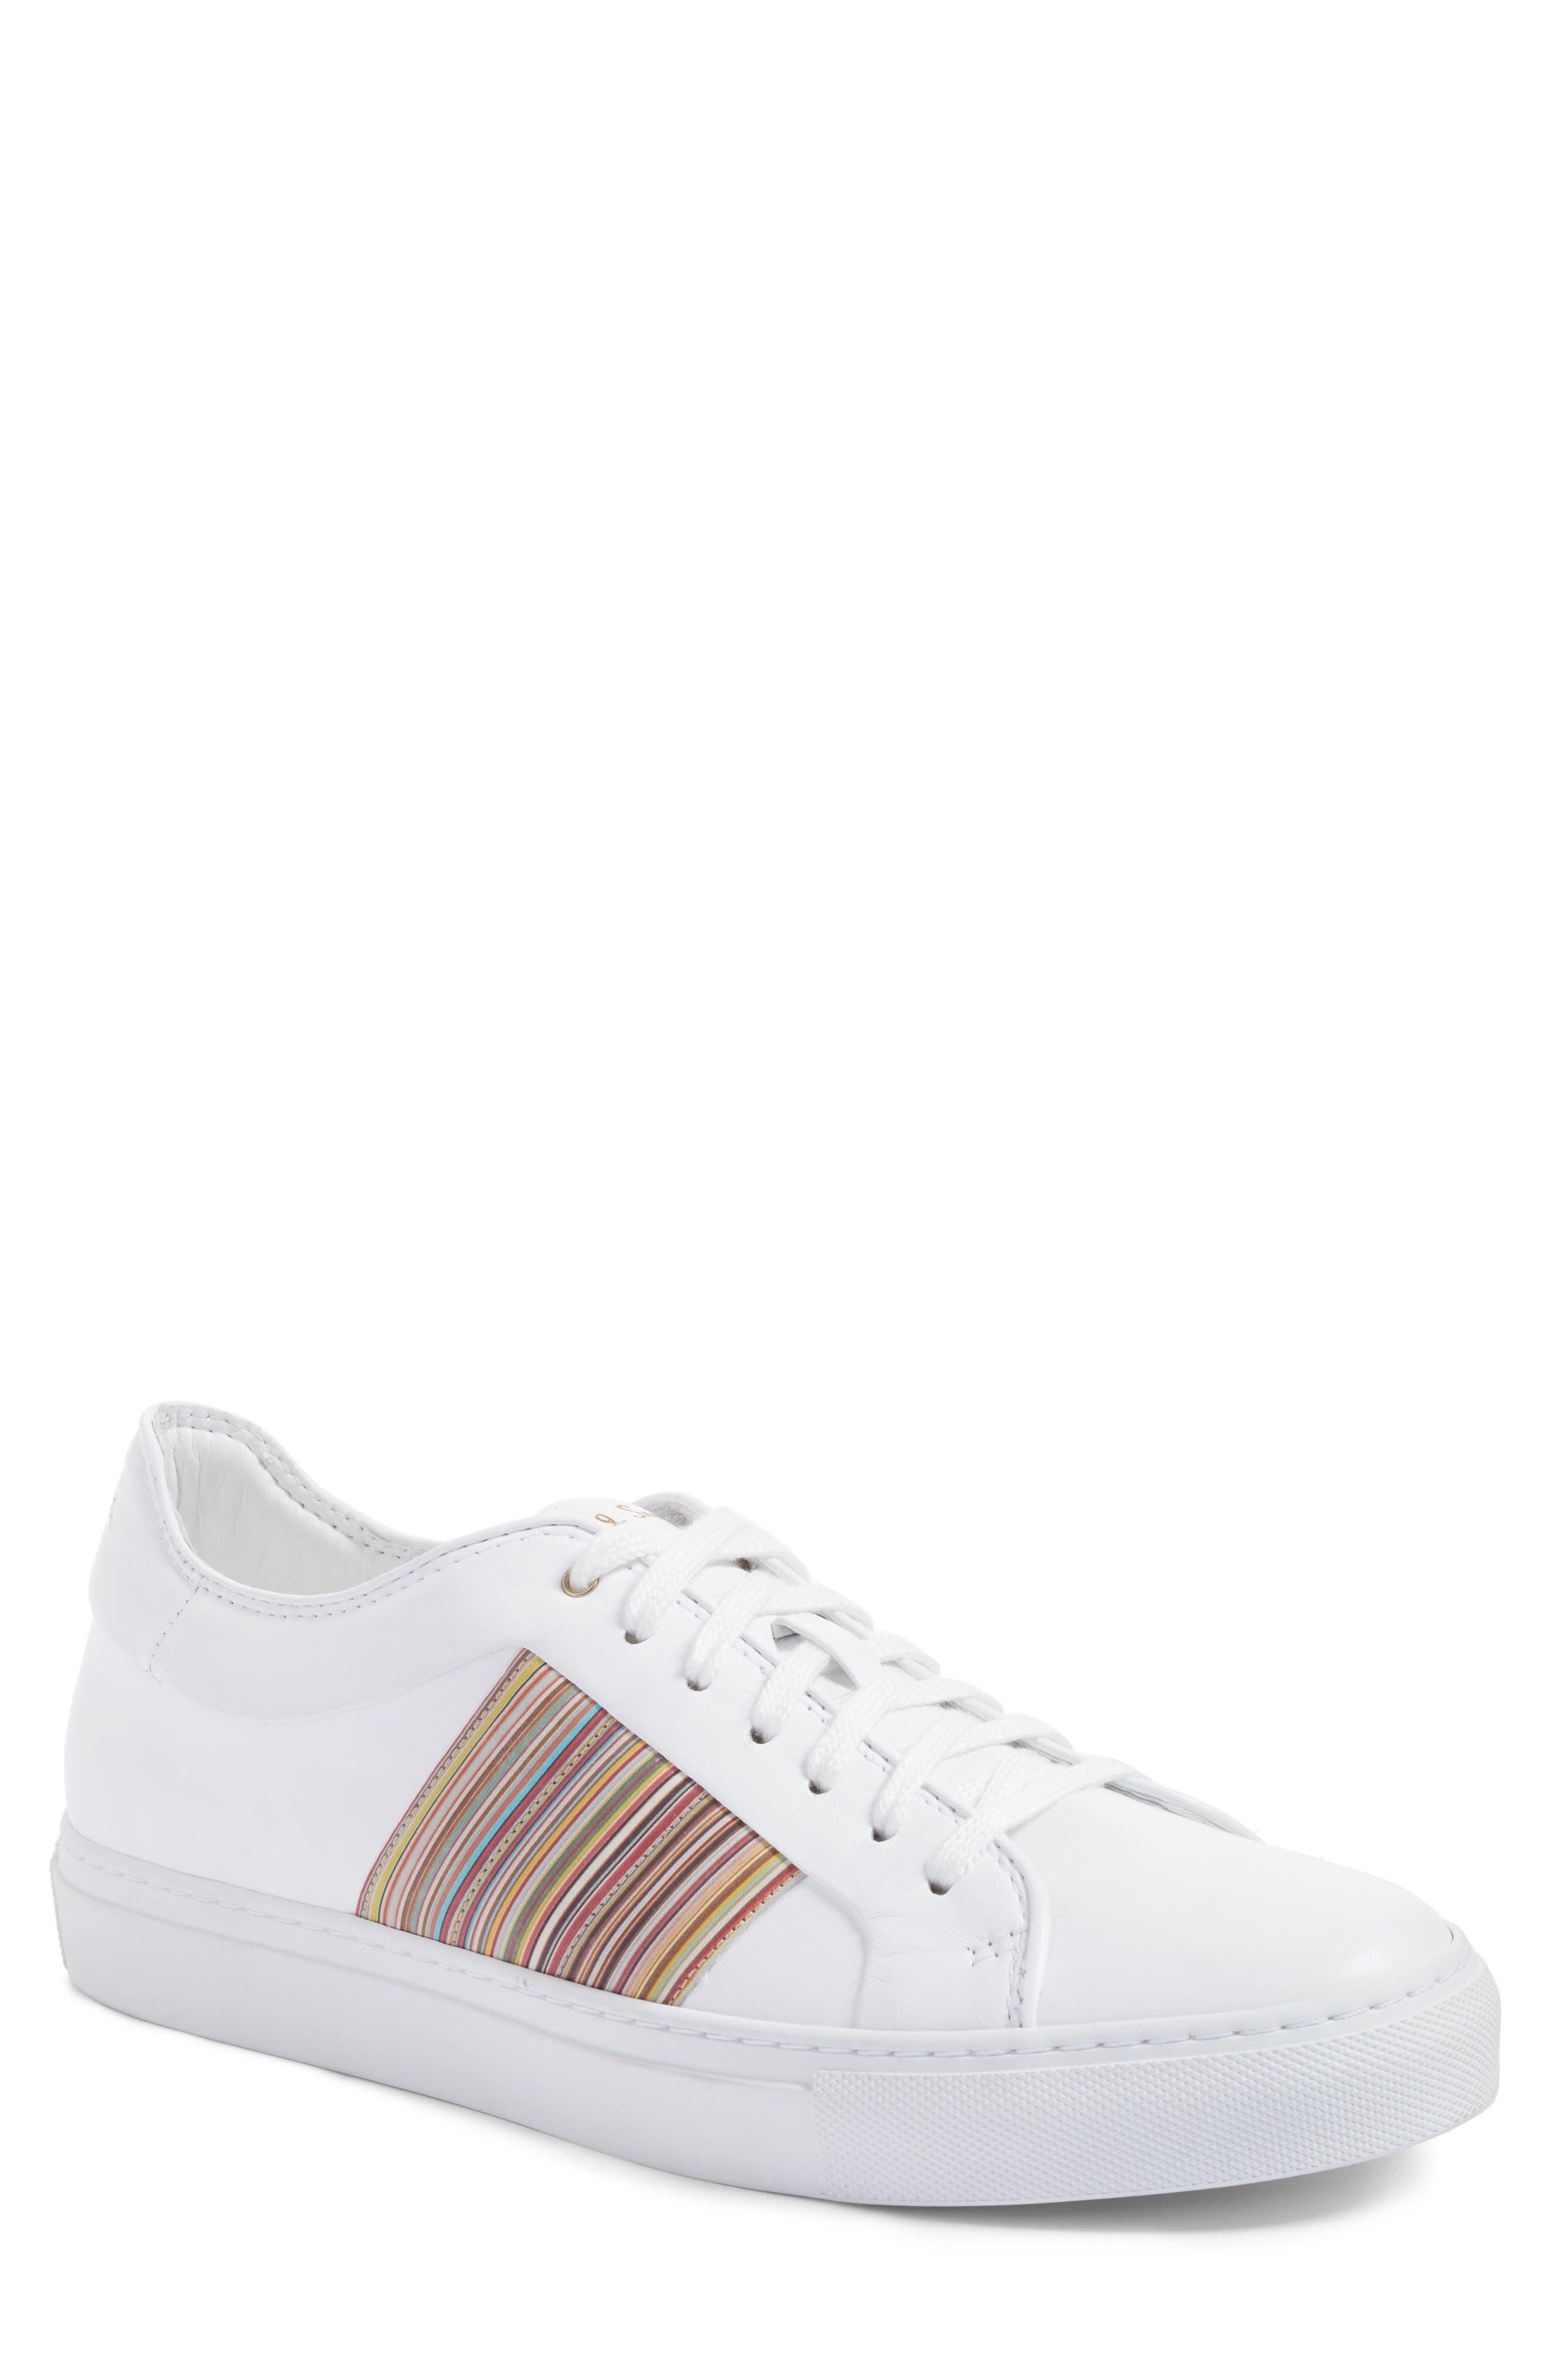 Ivo Sneaker,                         Main,                         color, White